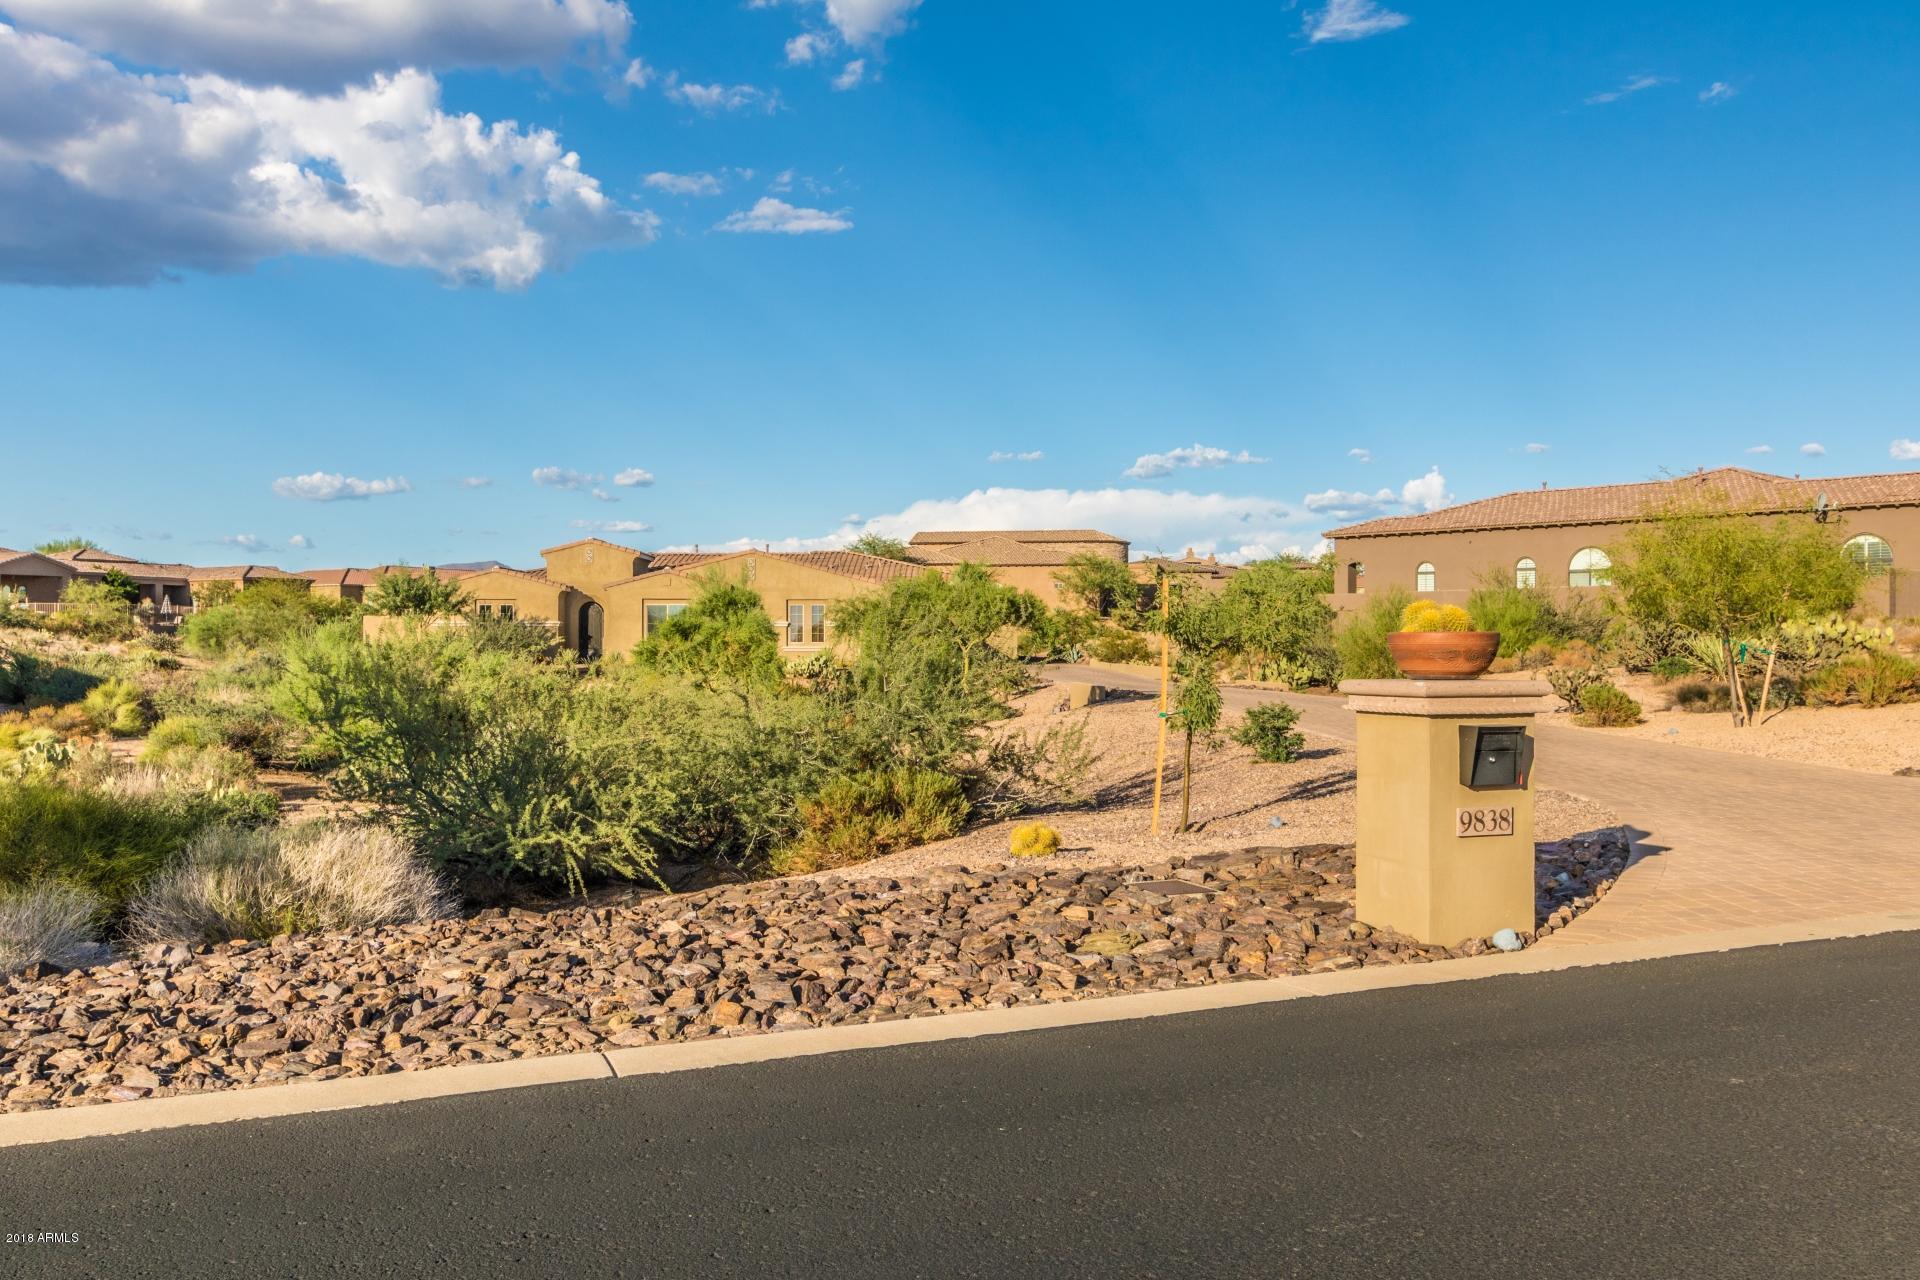 MLS 5829037 9838 E ADDY Way, Scottsdale, AZ Scottsdale AZ Mirabel Scenic